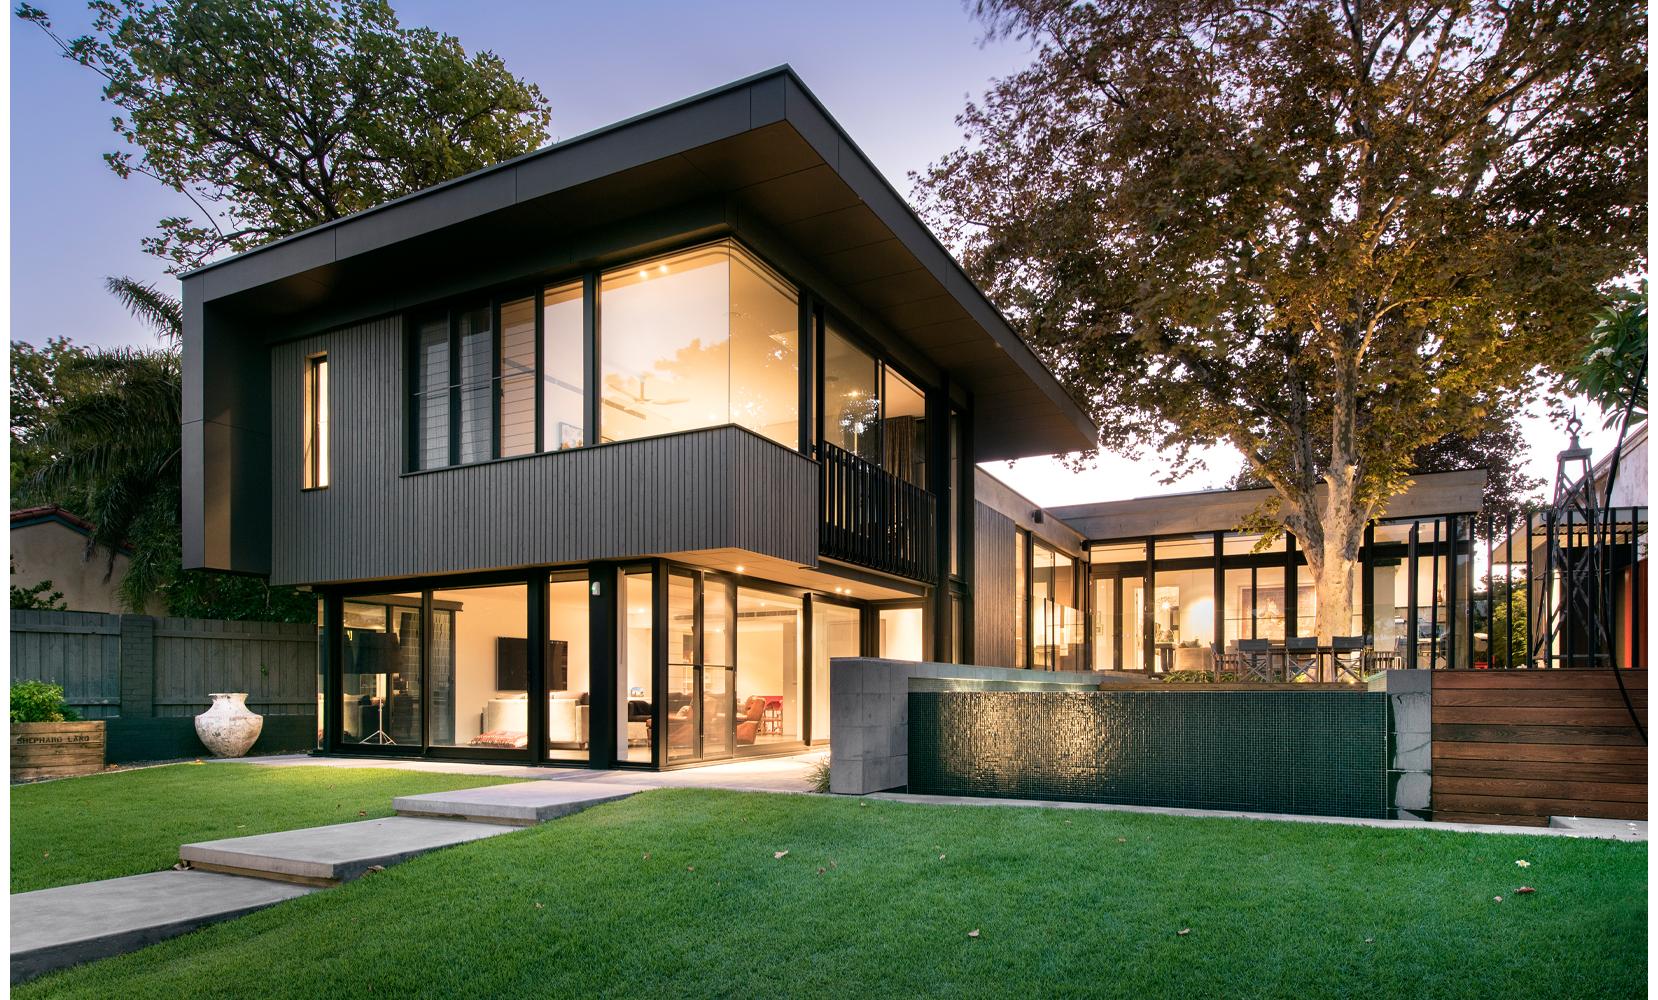 maek-luxury-home-design-inspiration-peppermintgrove-27v-frontexterior-gallery-21.jpg